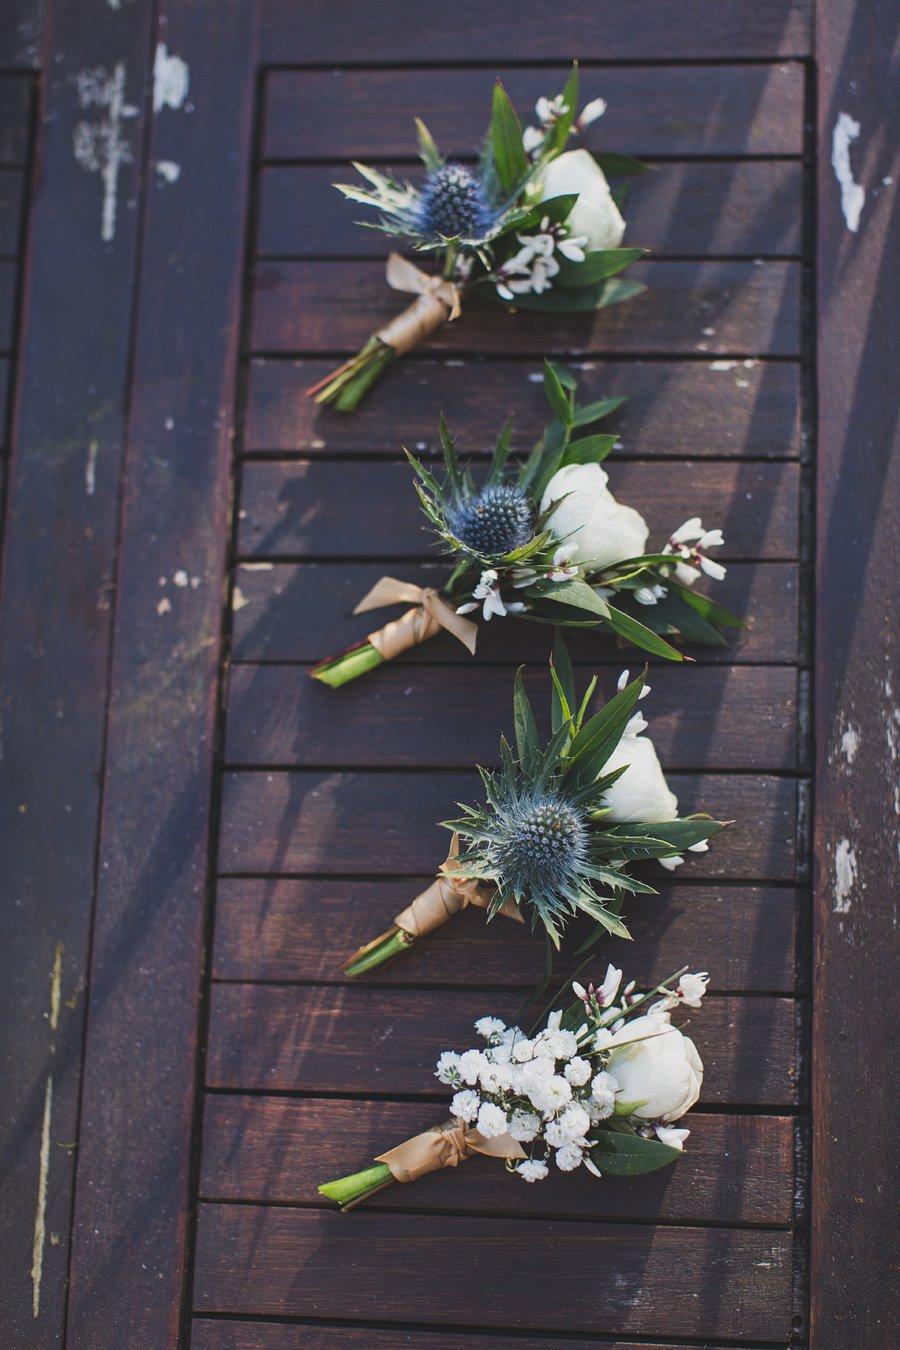 Buxted-Park-Wedding-Photographer-Suzanne-and-Matt-Simon-Fazackarley-16